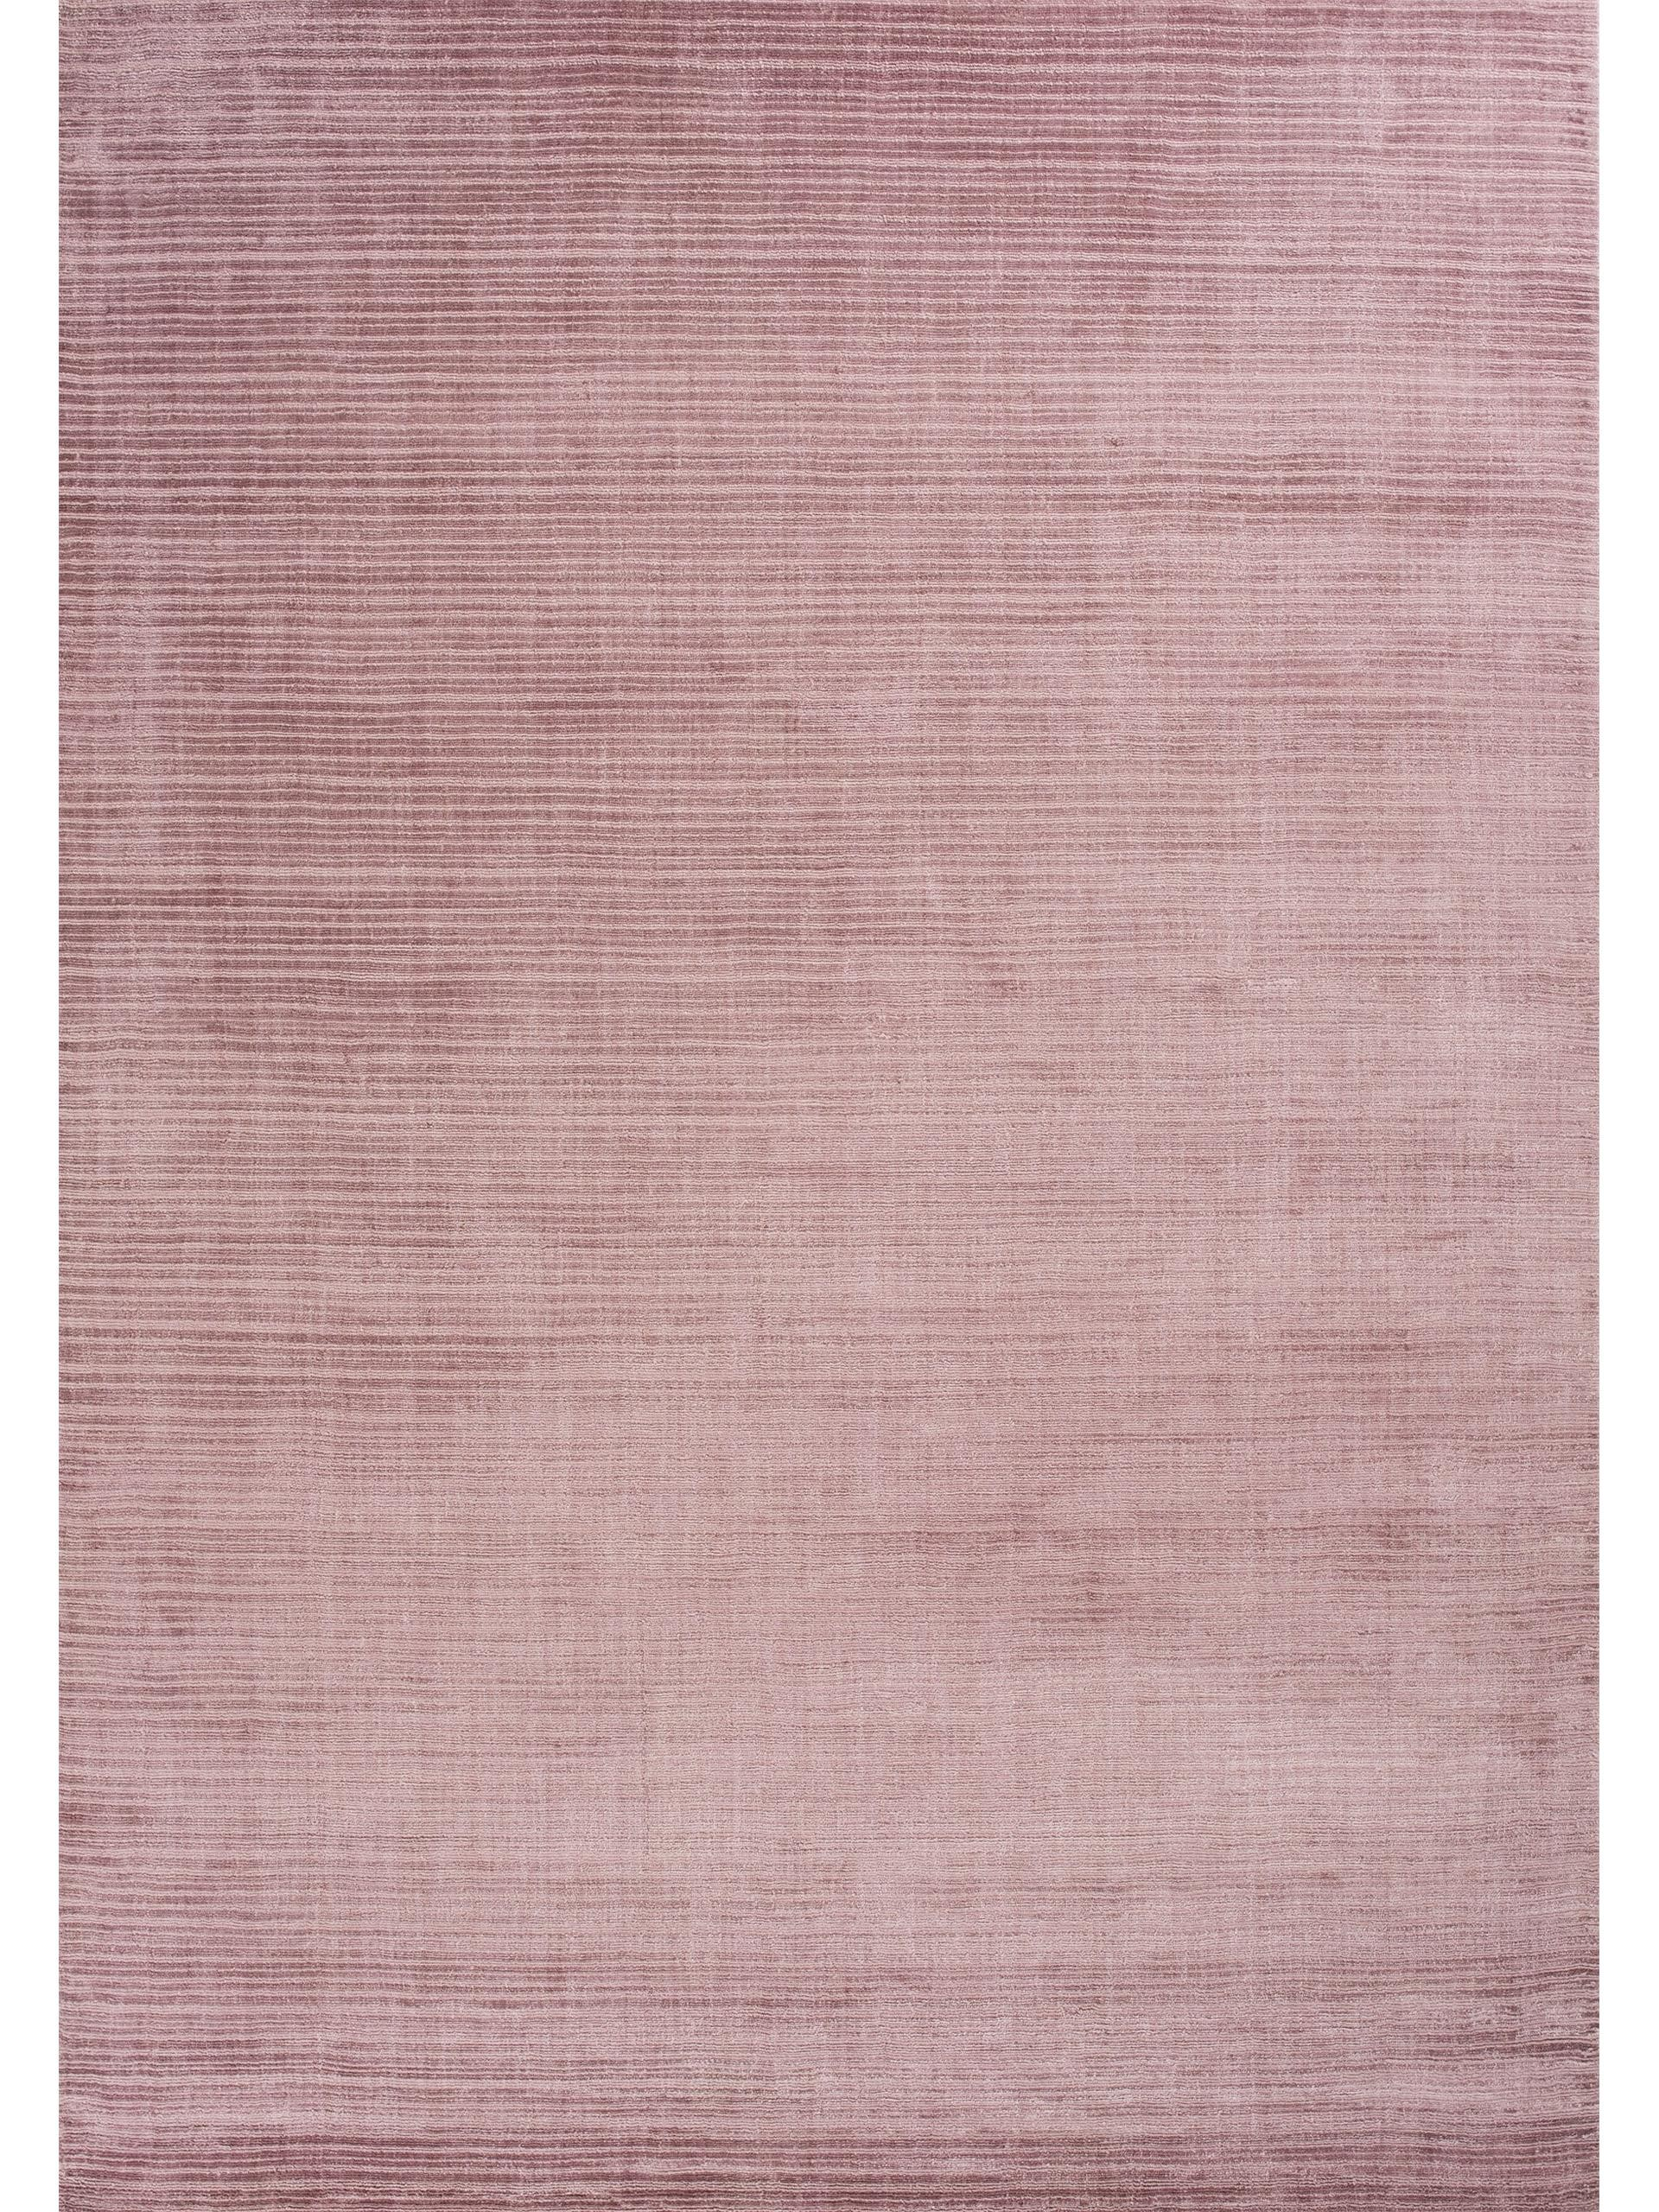 linie-design-teppich-cover-rosa-310000061-1